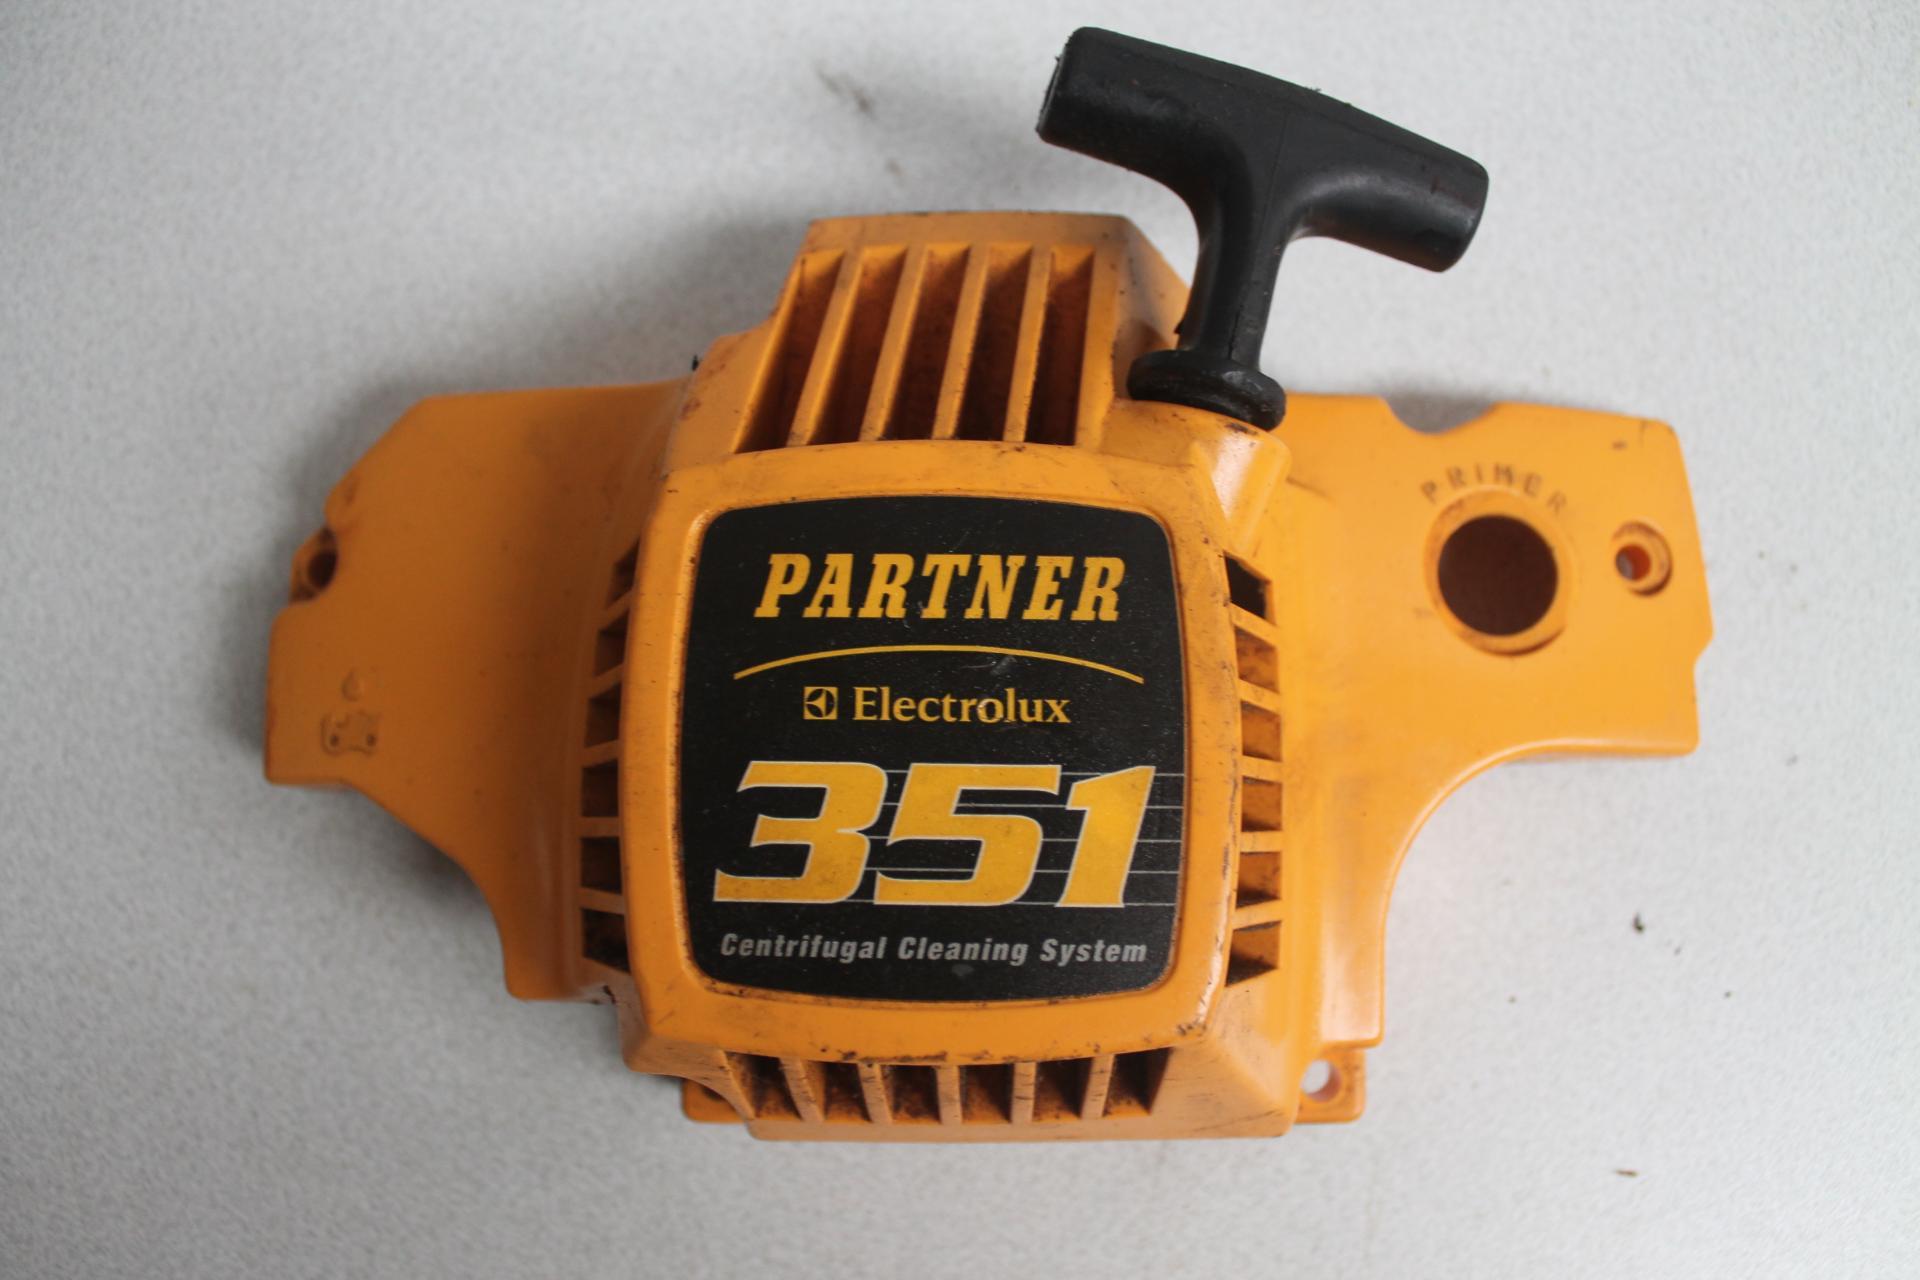 Arranque Partner 351